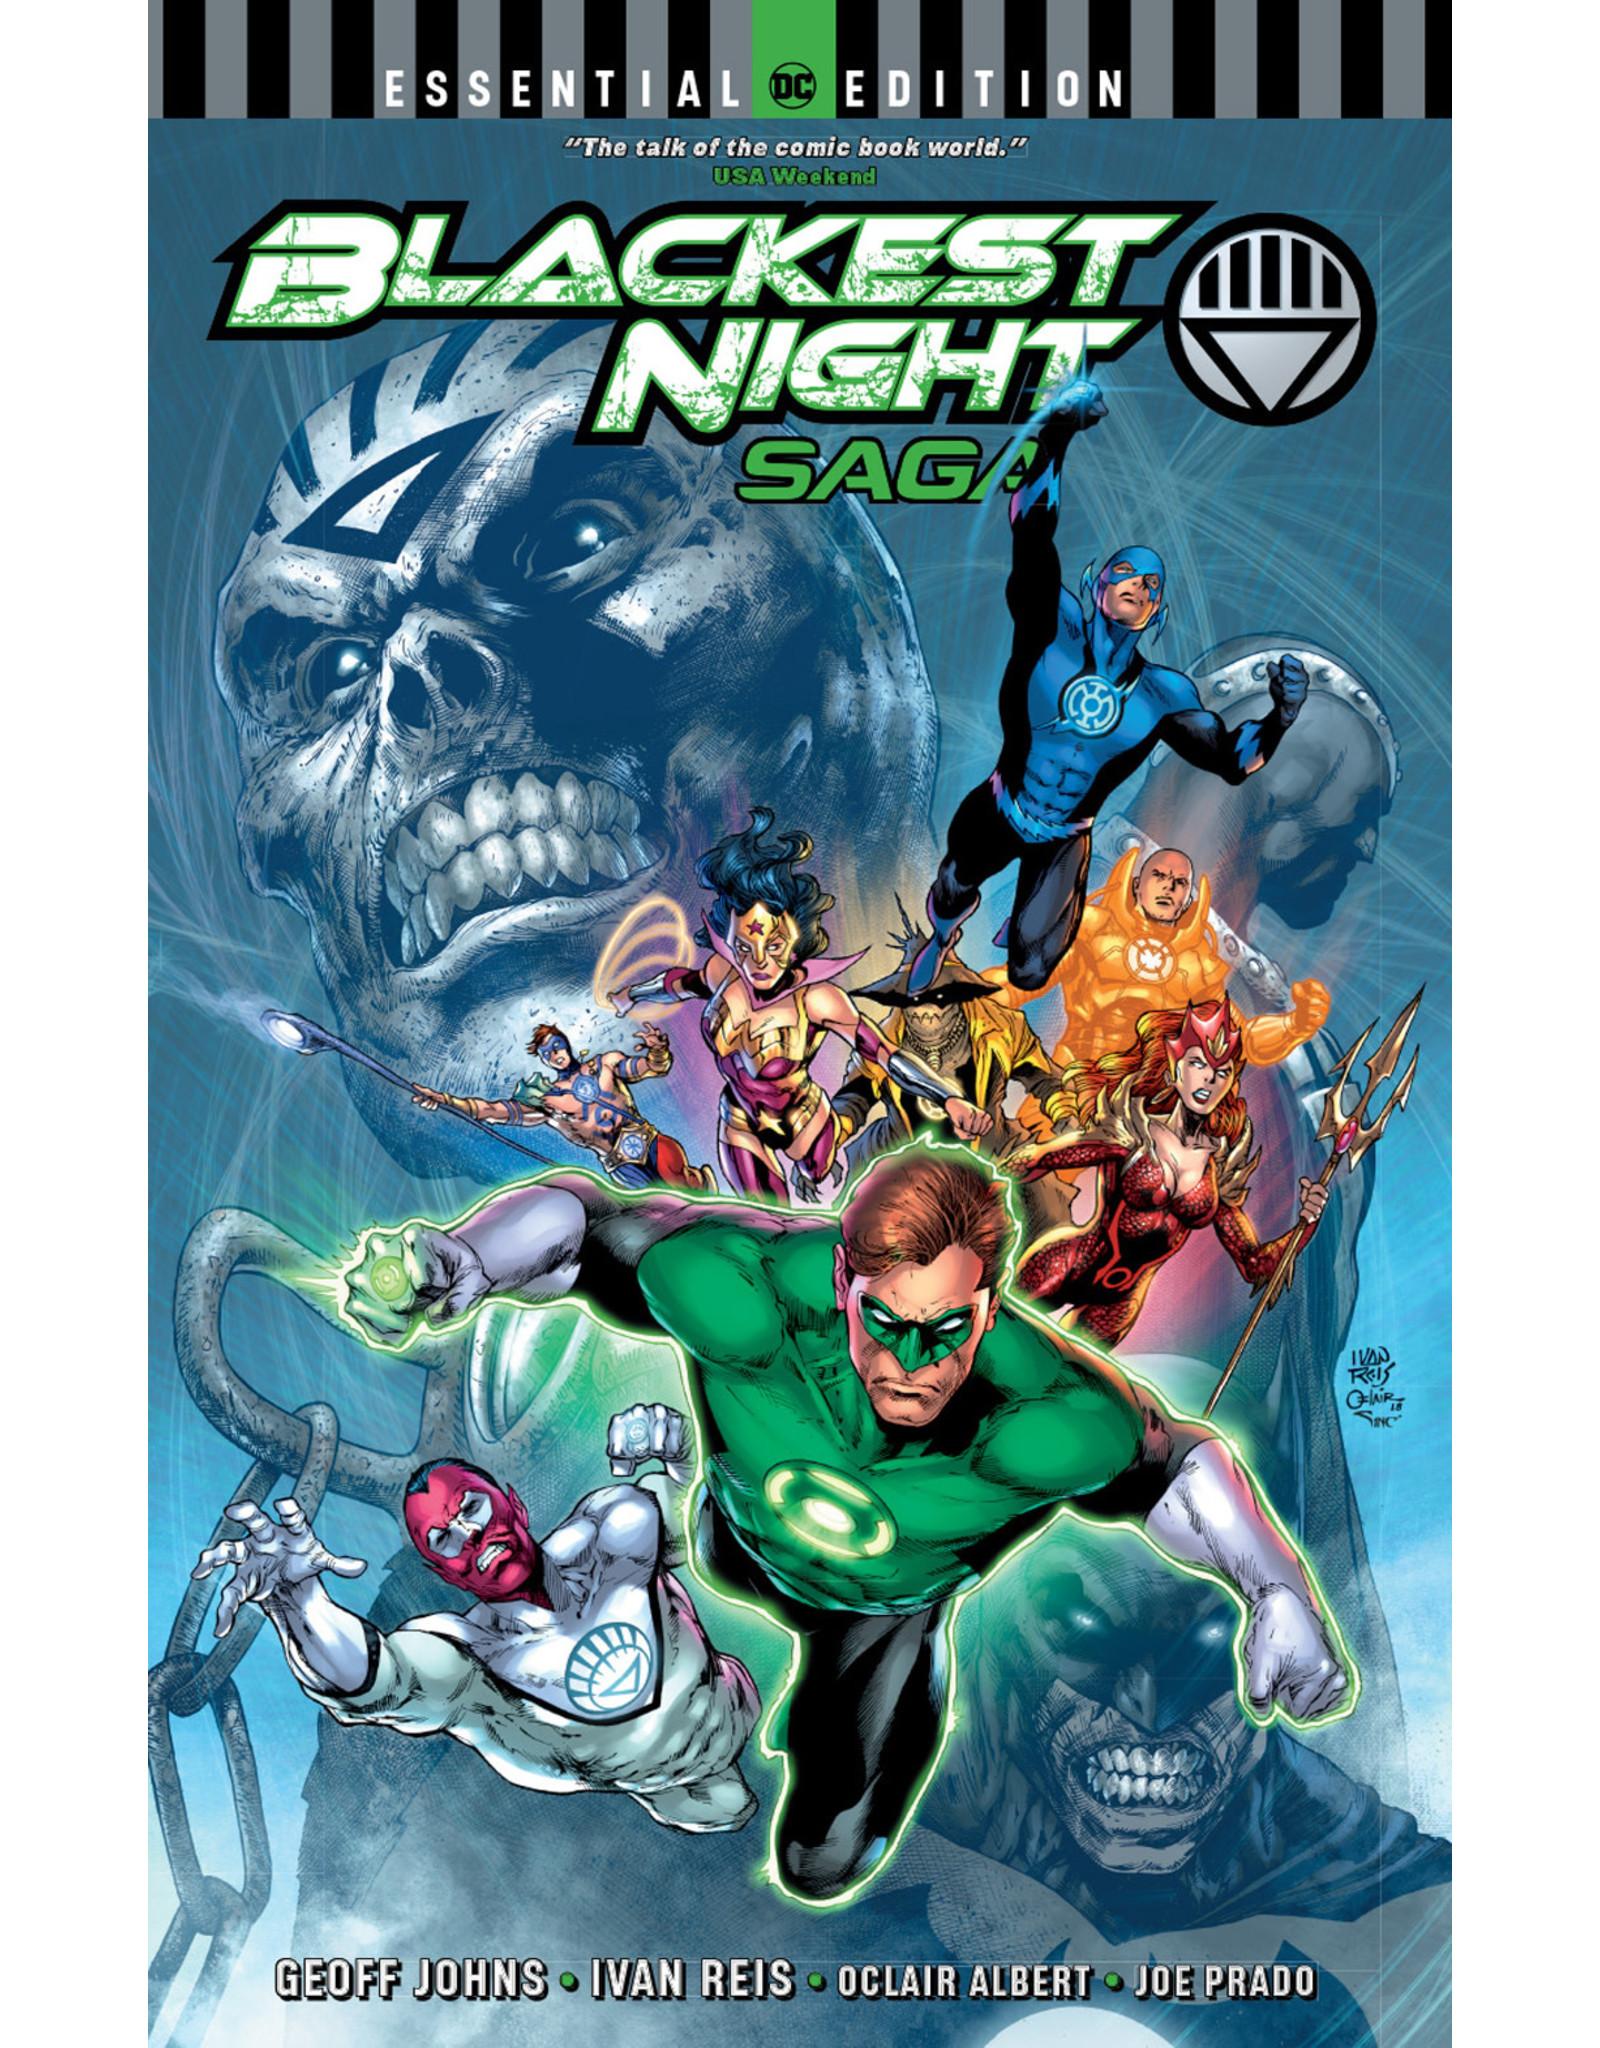 DC COMICS BLACKEST NIGHT SAGA ESSENTIAL EDITION TP